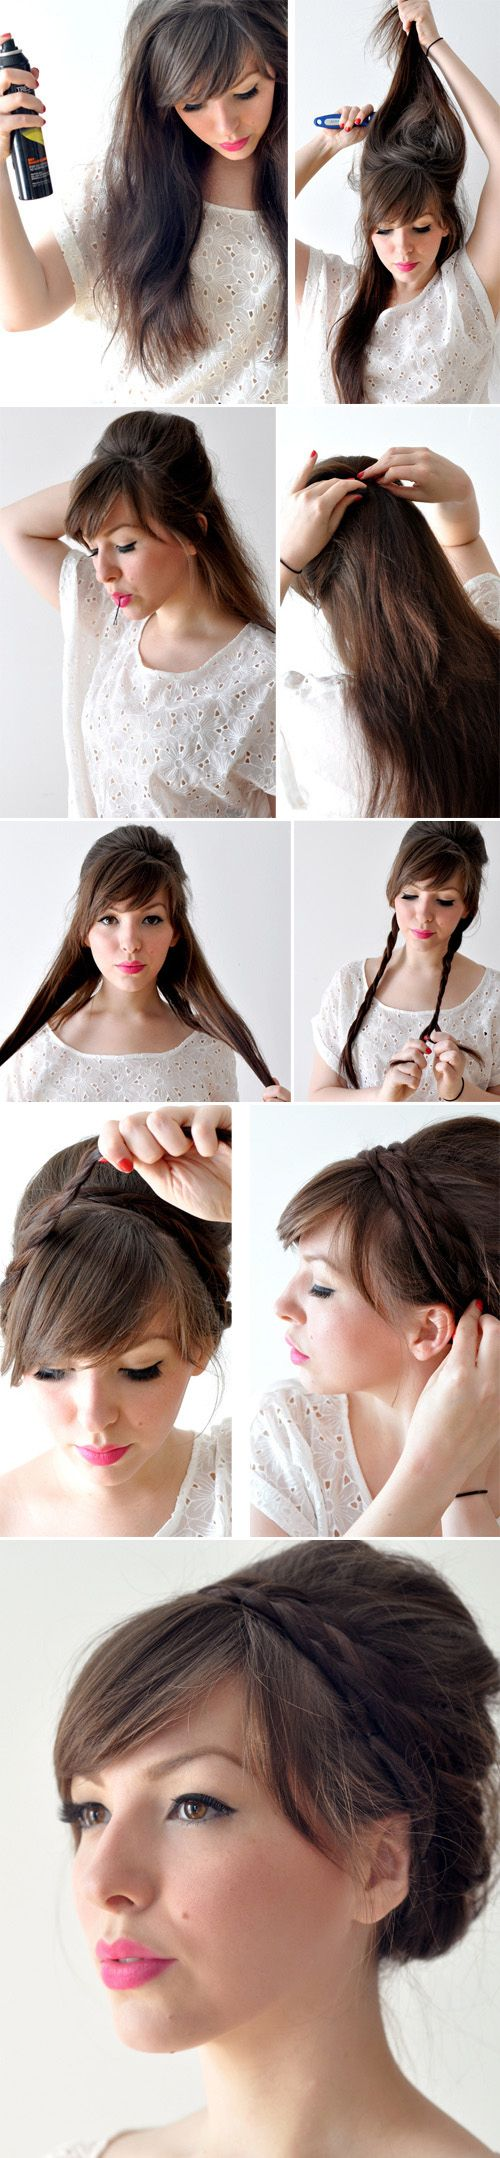 Peinados de novia recogidos Paso a Paso. No te pierdas este tutorial!